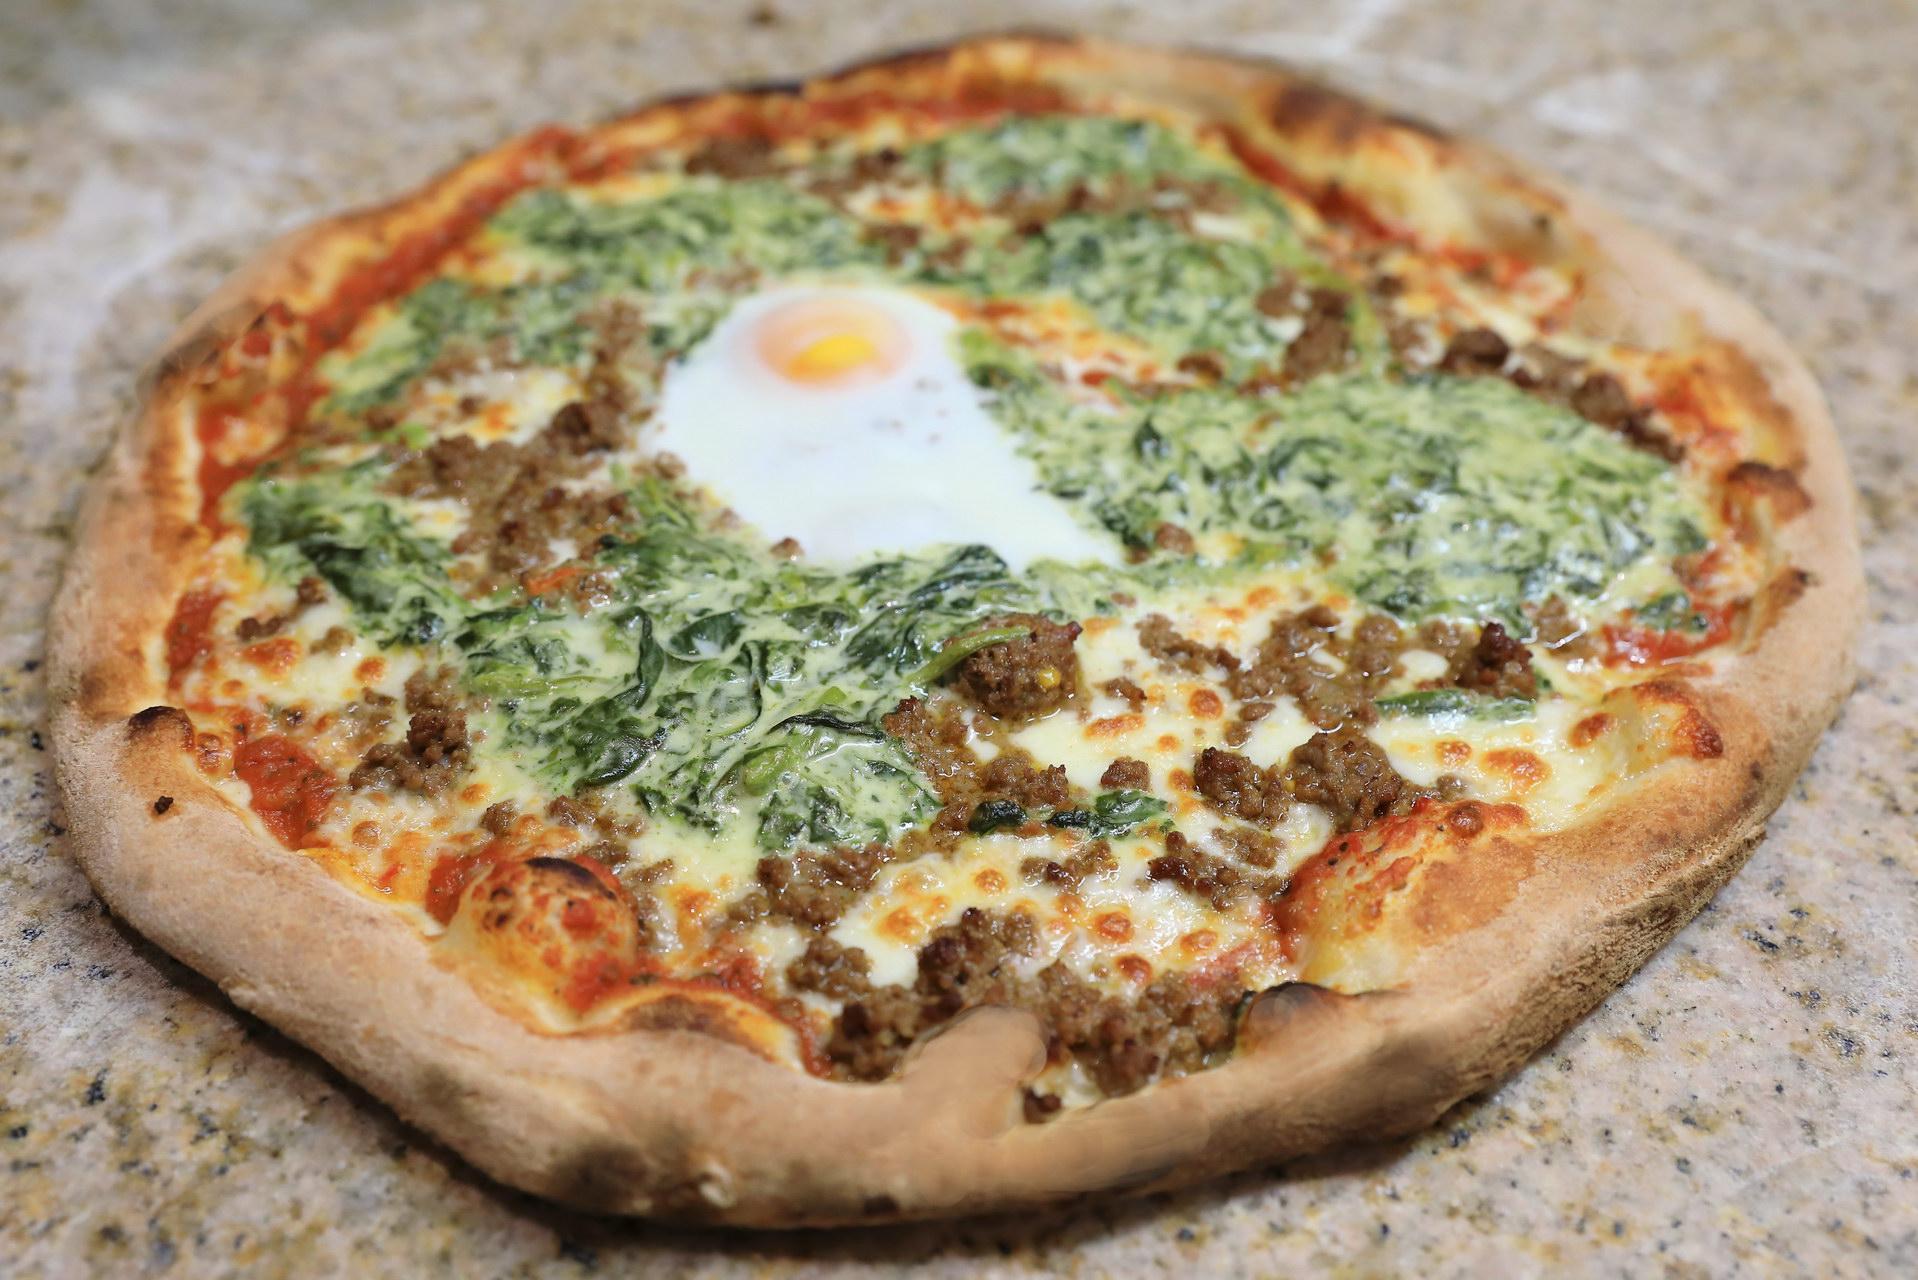 Le-Mediterraneen-Pizza-Braine-l-Alleud-0066.jpg